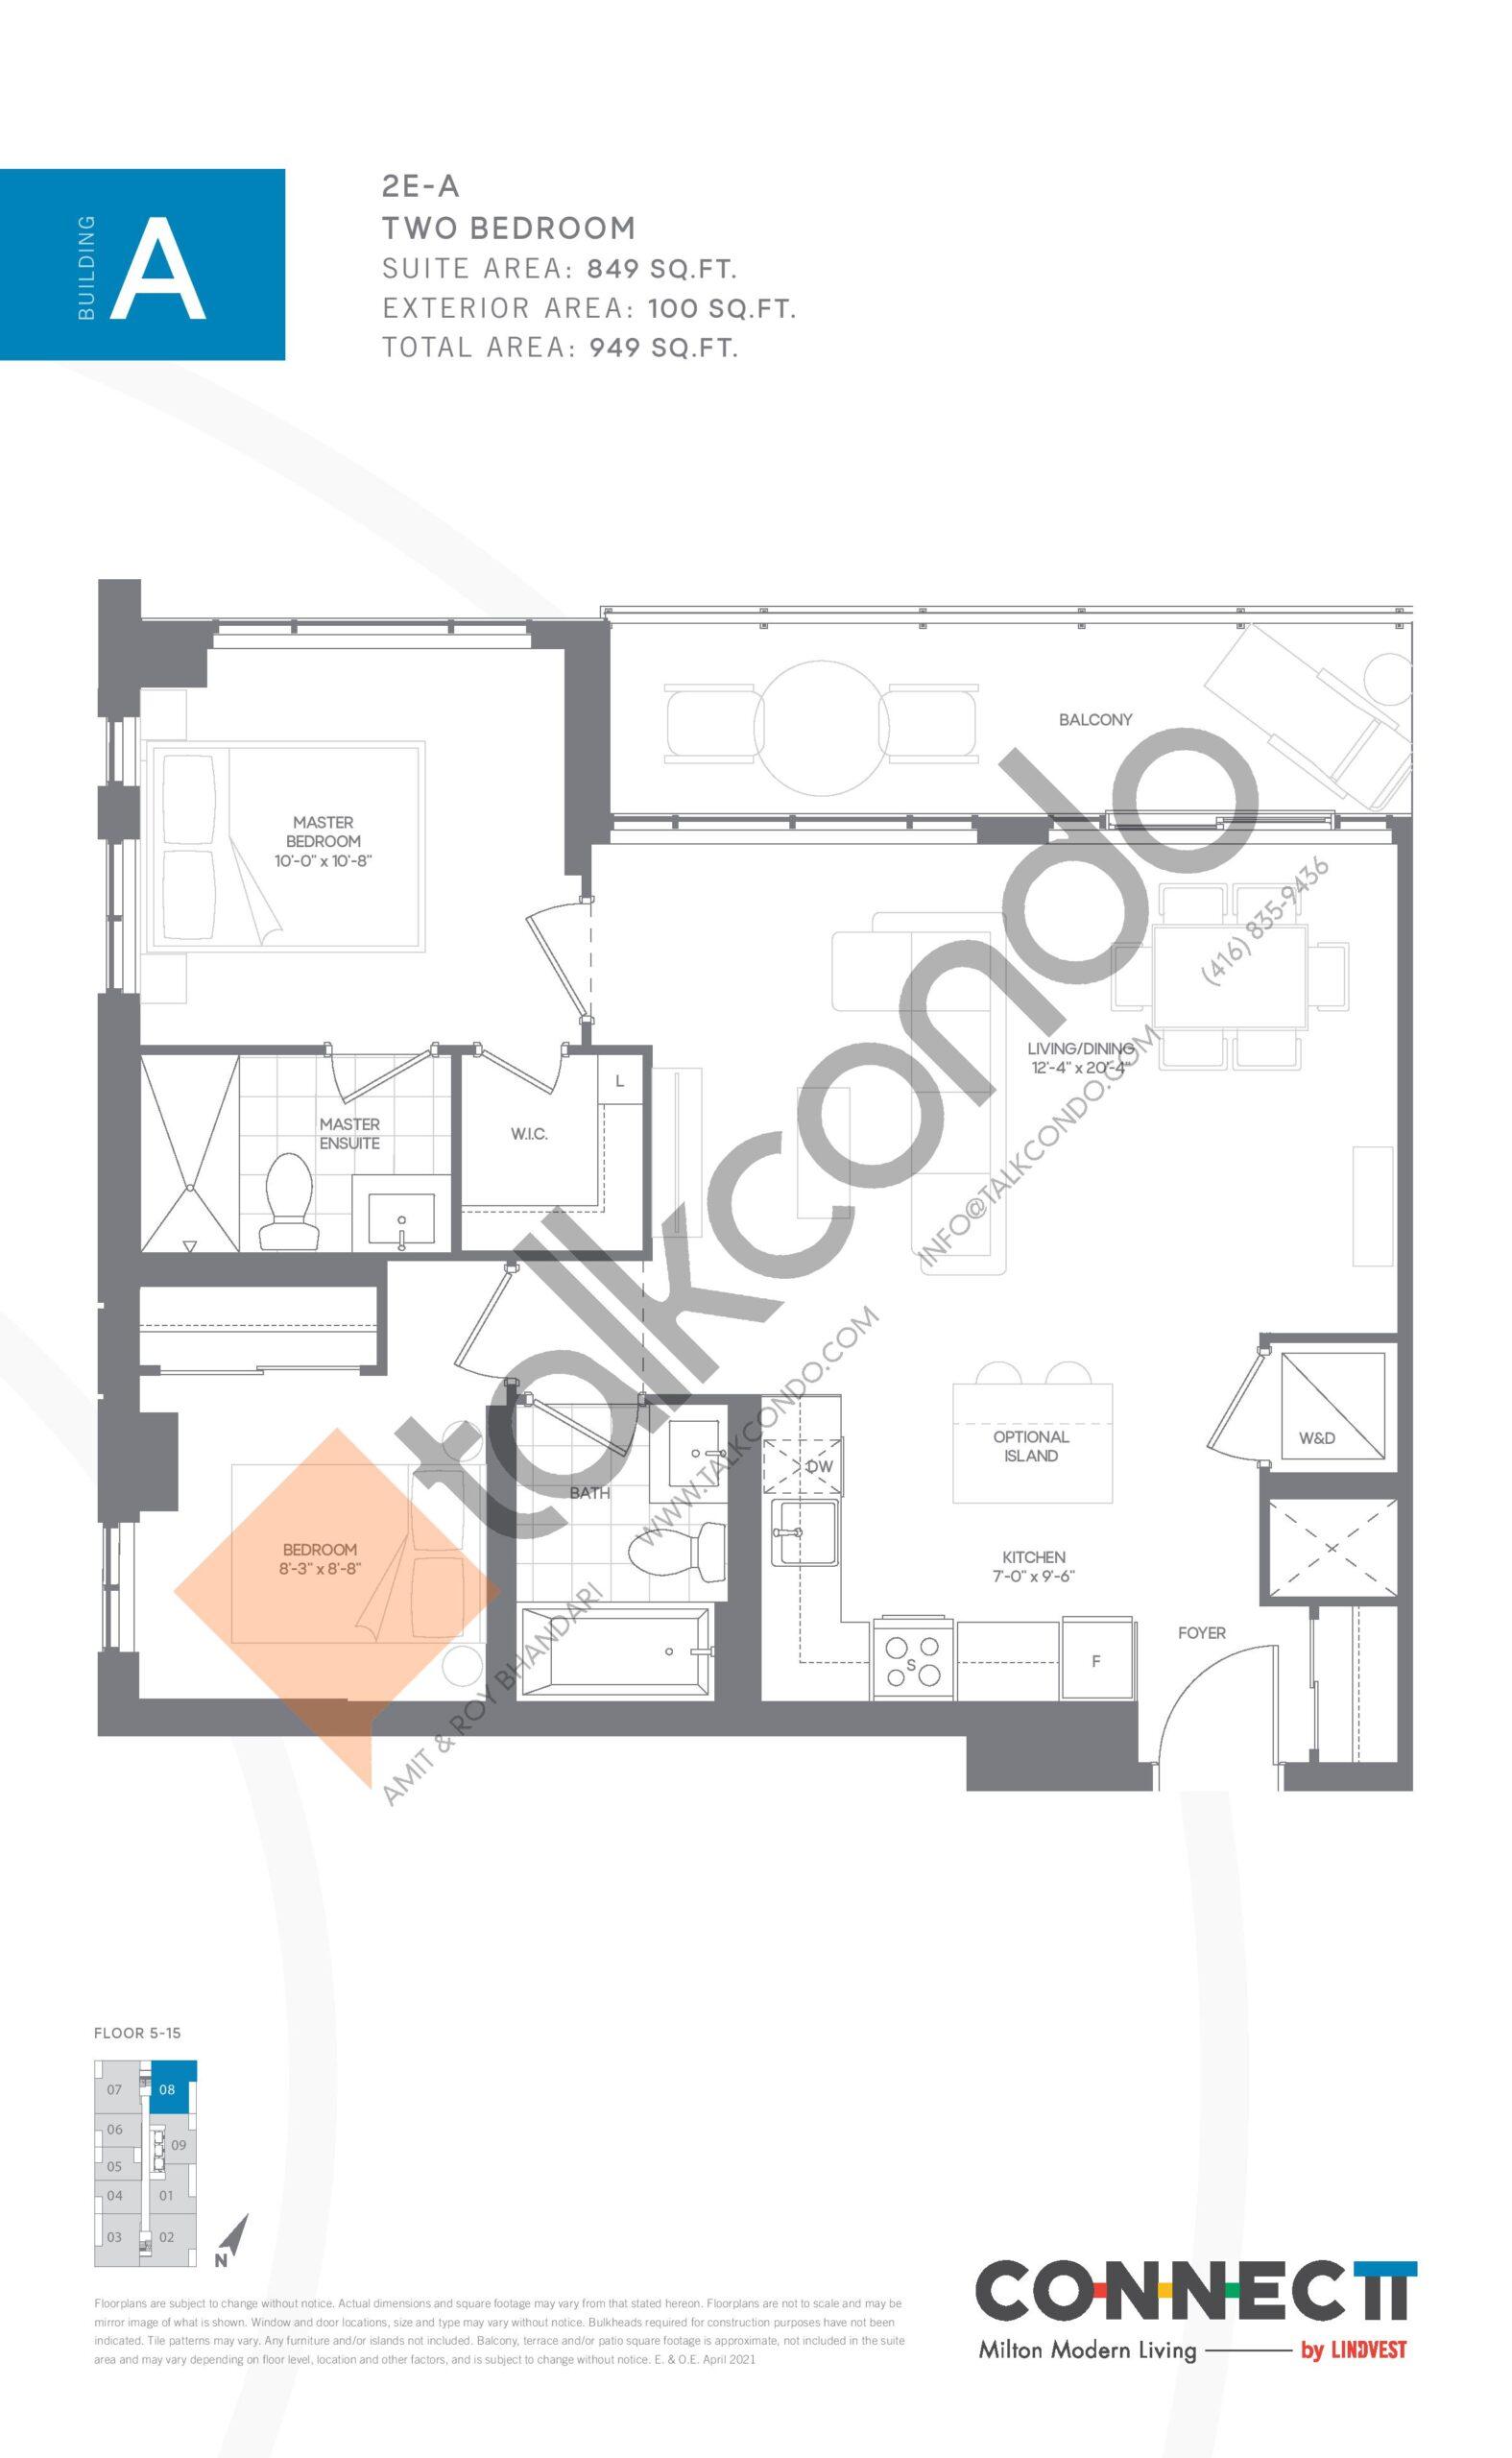 2E-A Floor Plan at Connectt Urban Community Condos - 849 sq.ft